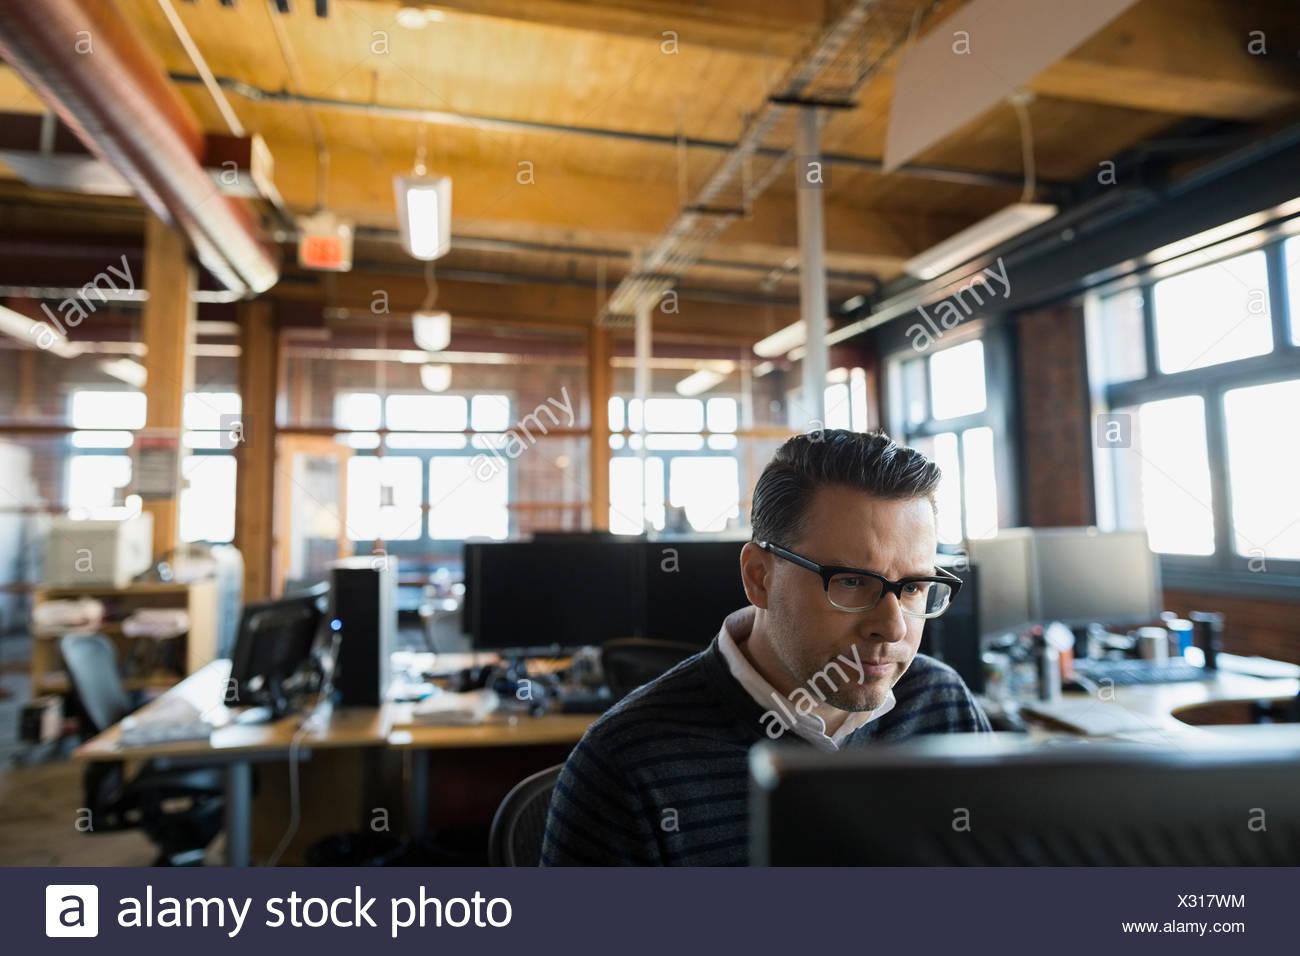 Ernst Kaufmann, arbeiten am Computer im Büro Stockbild